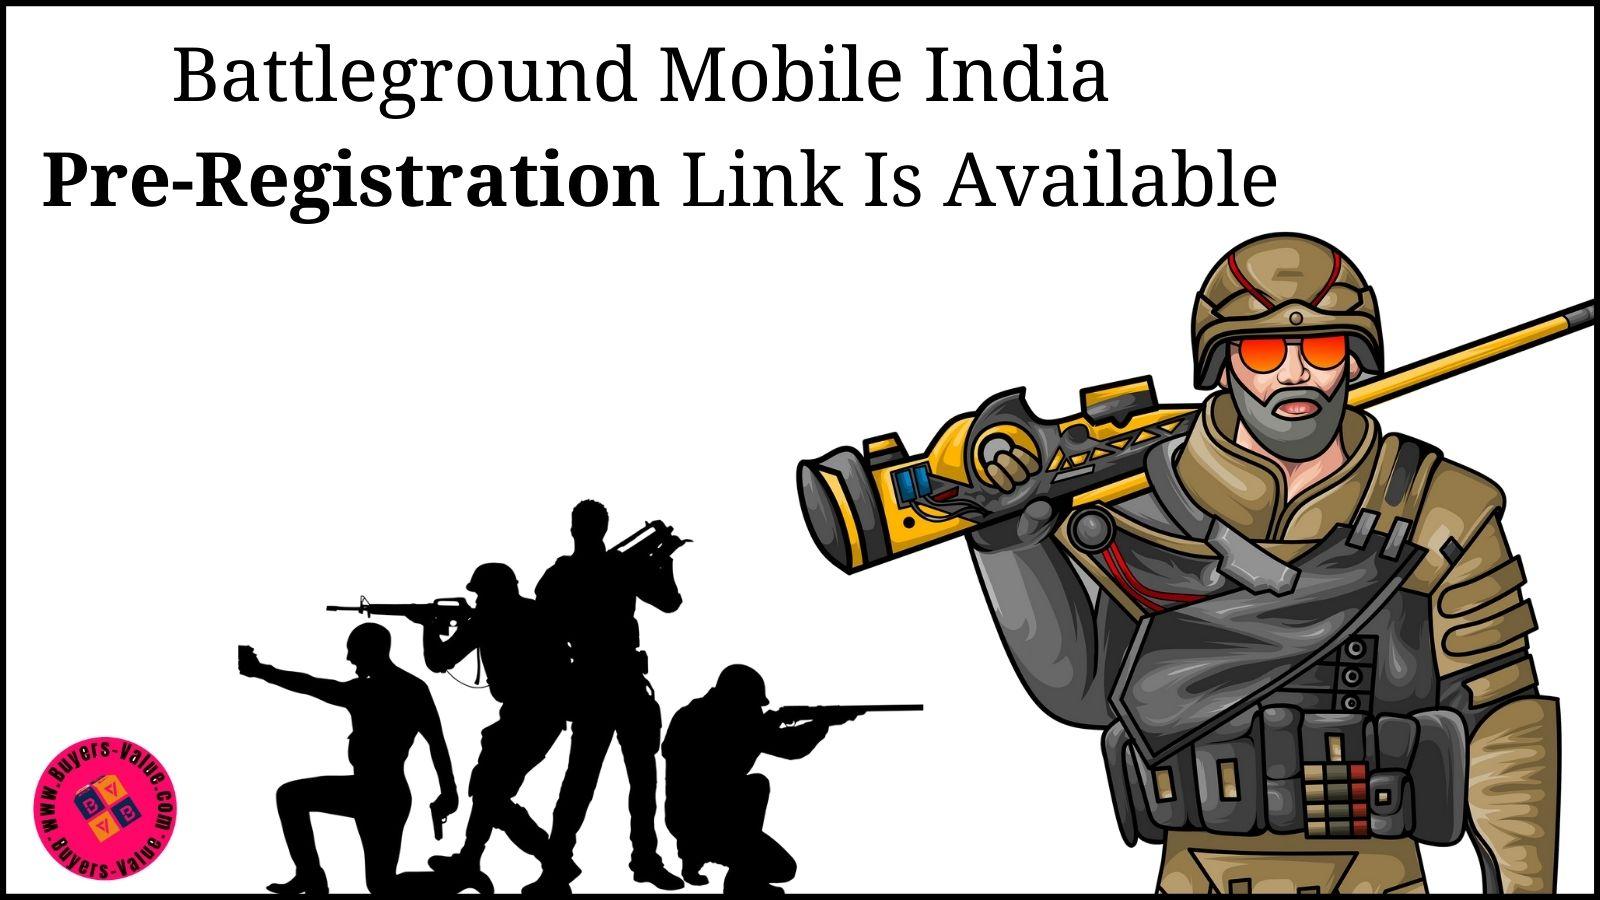 Battleground Mobile India Goes Live